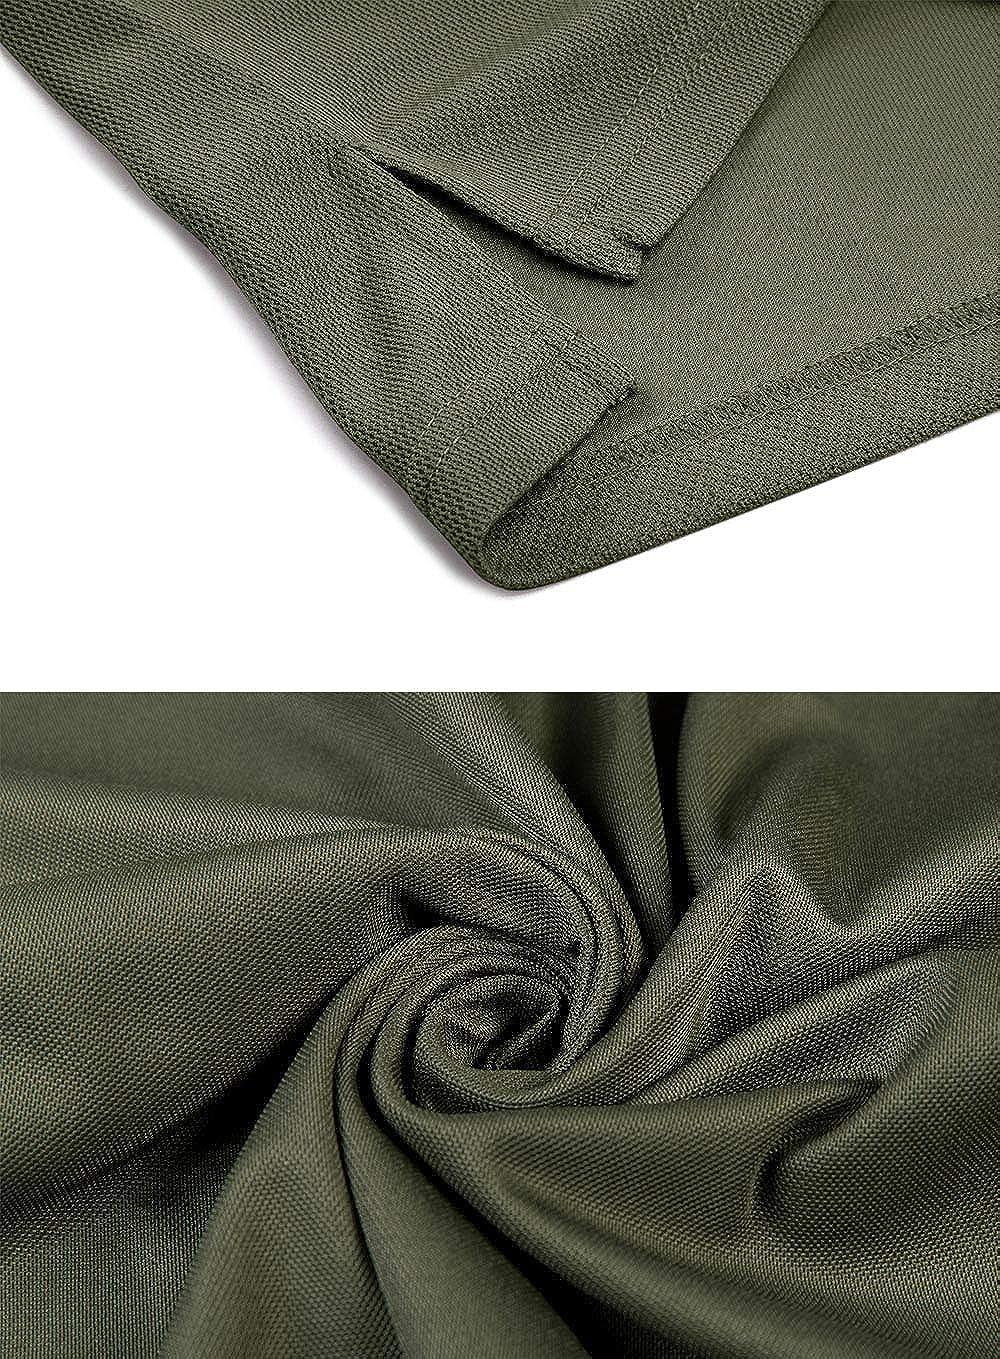 Camisas t/ácticas para Hombre para Deportes de Golf Manga Larga EKLENTSON Ligero de Secado r/ápido Transpirable Estilo Militar